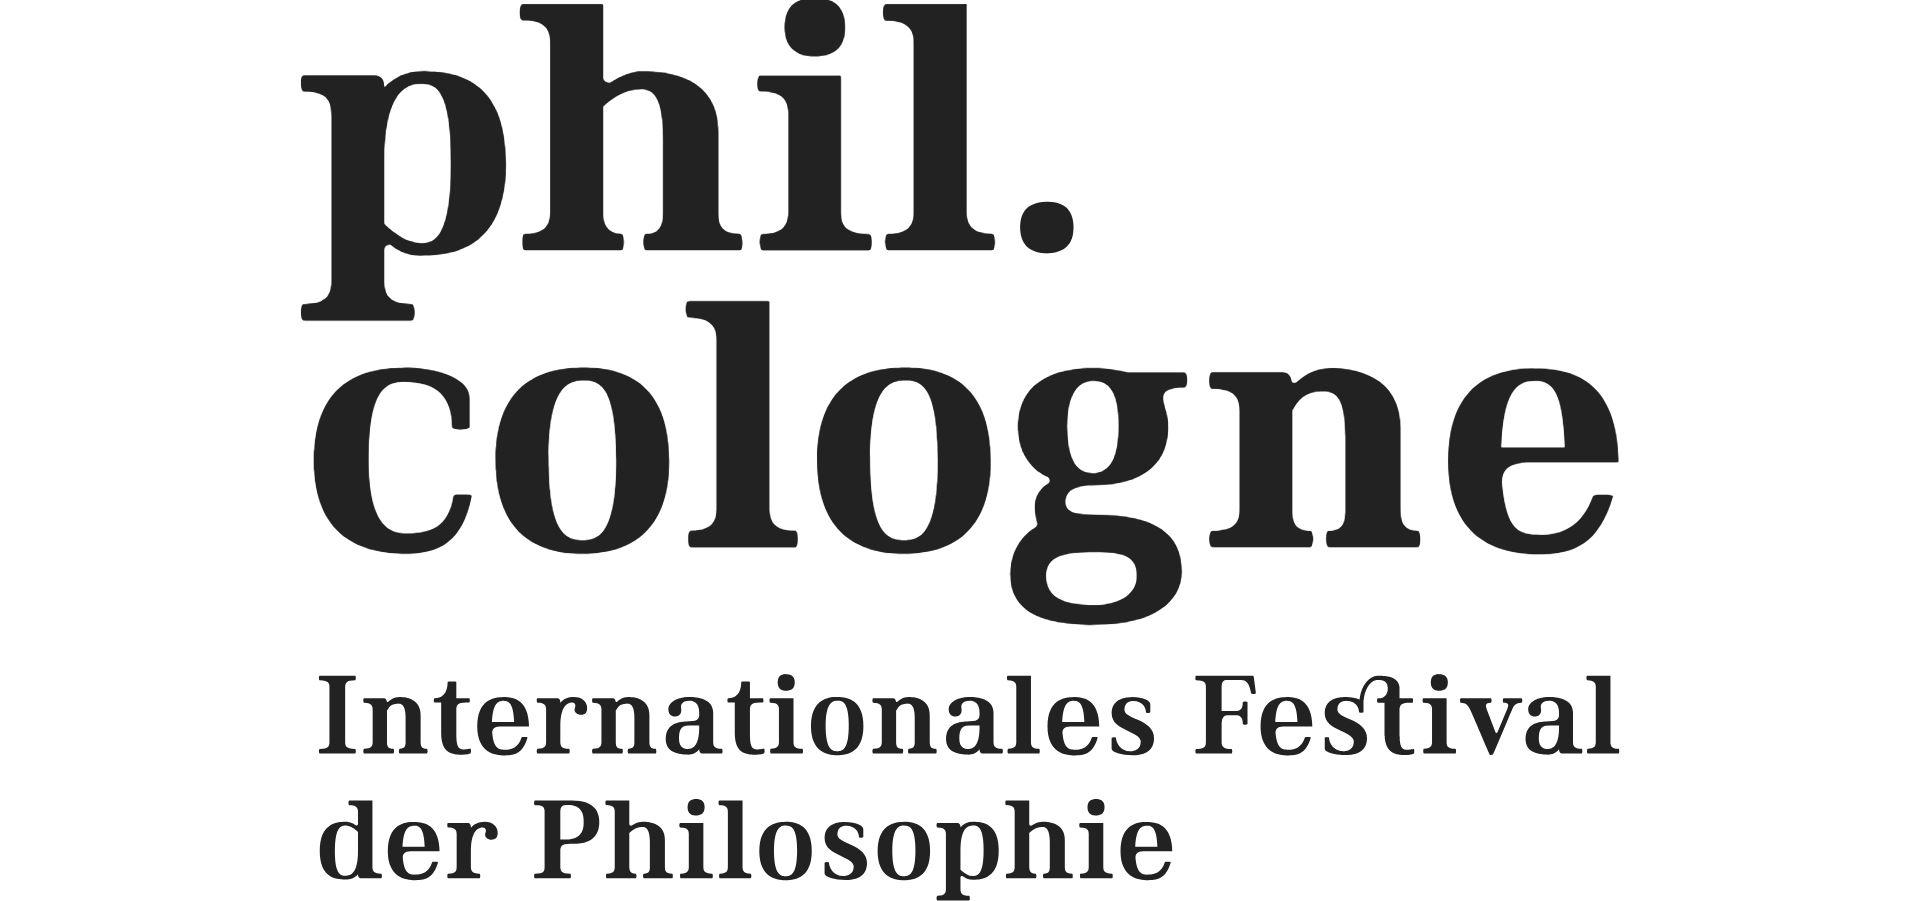 phil.cologne 2020